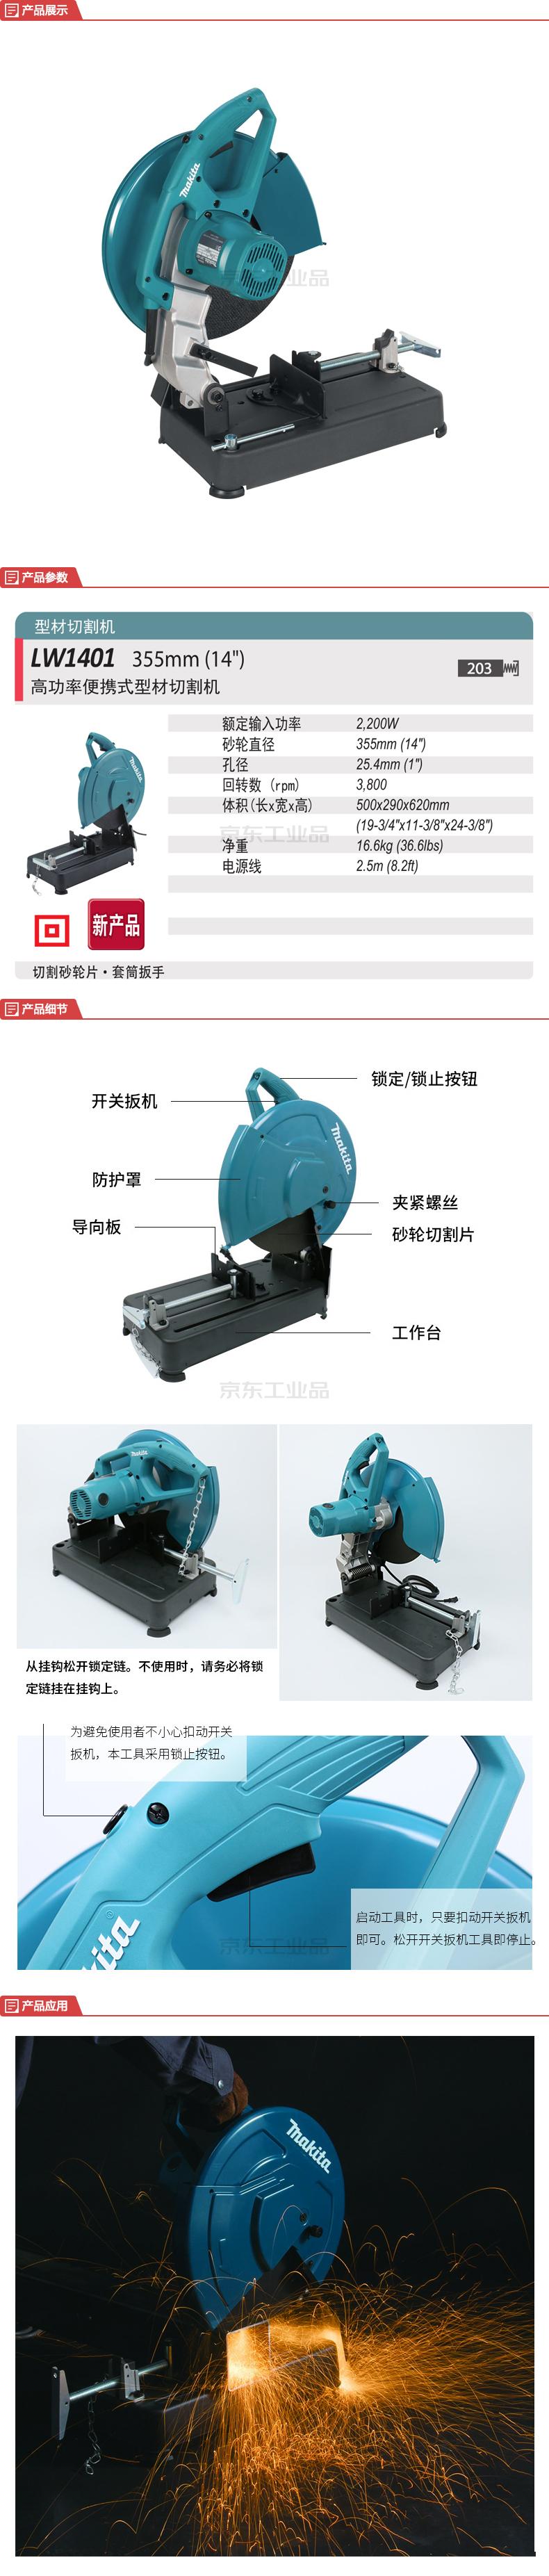 牧田(makita) 型材切割机355mm(14寸);LW1401